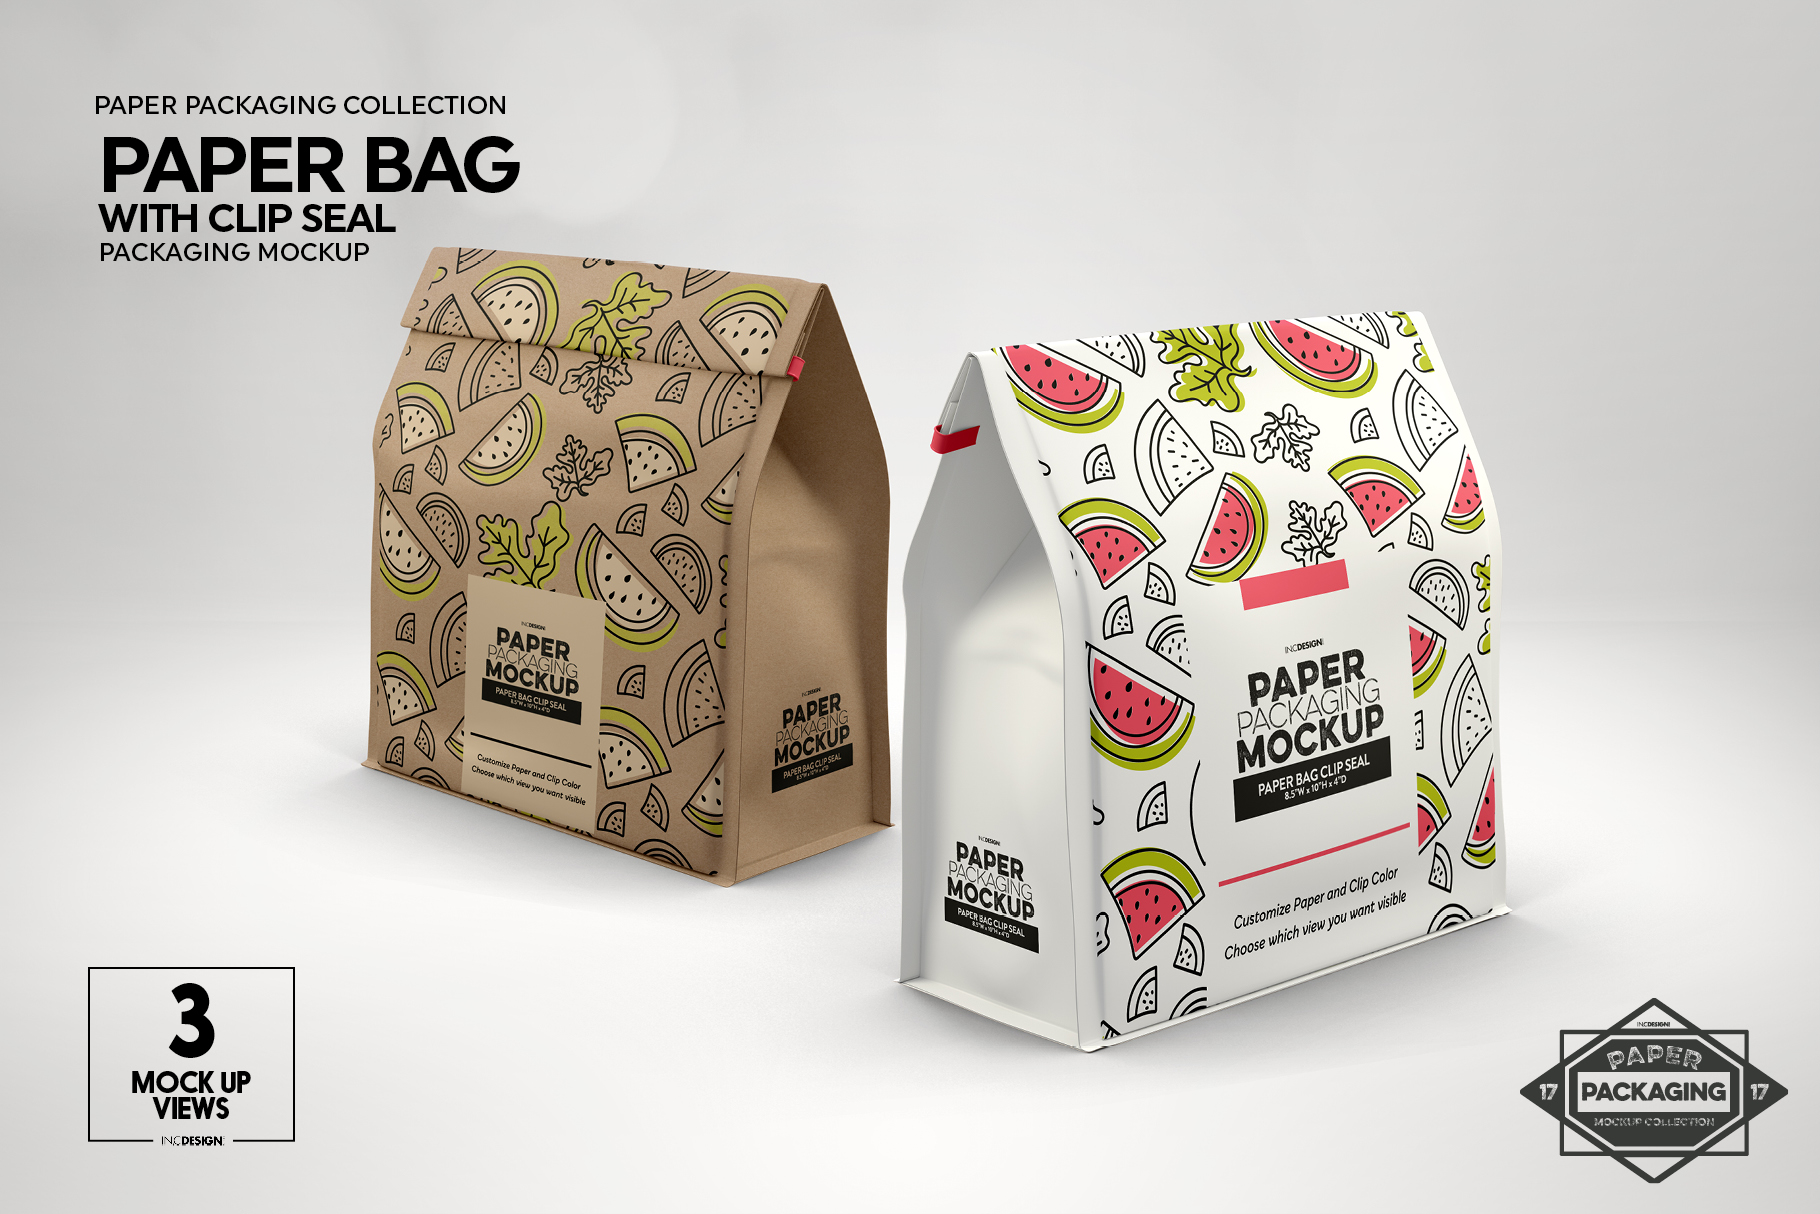 VOL. 17 Paper Box Packaging Mockups example image 7